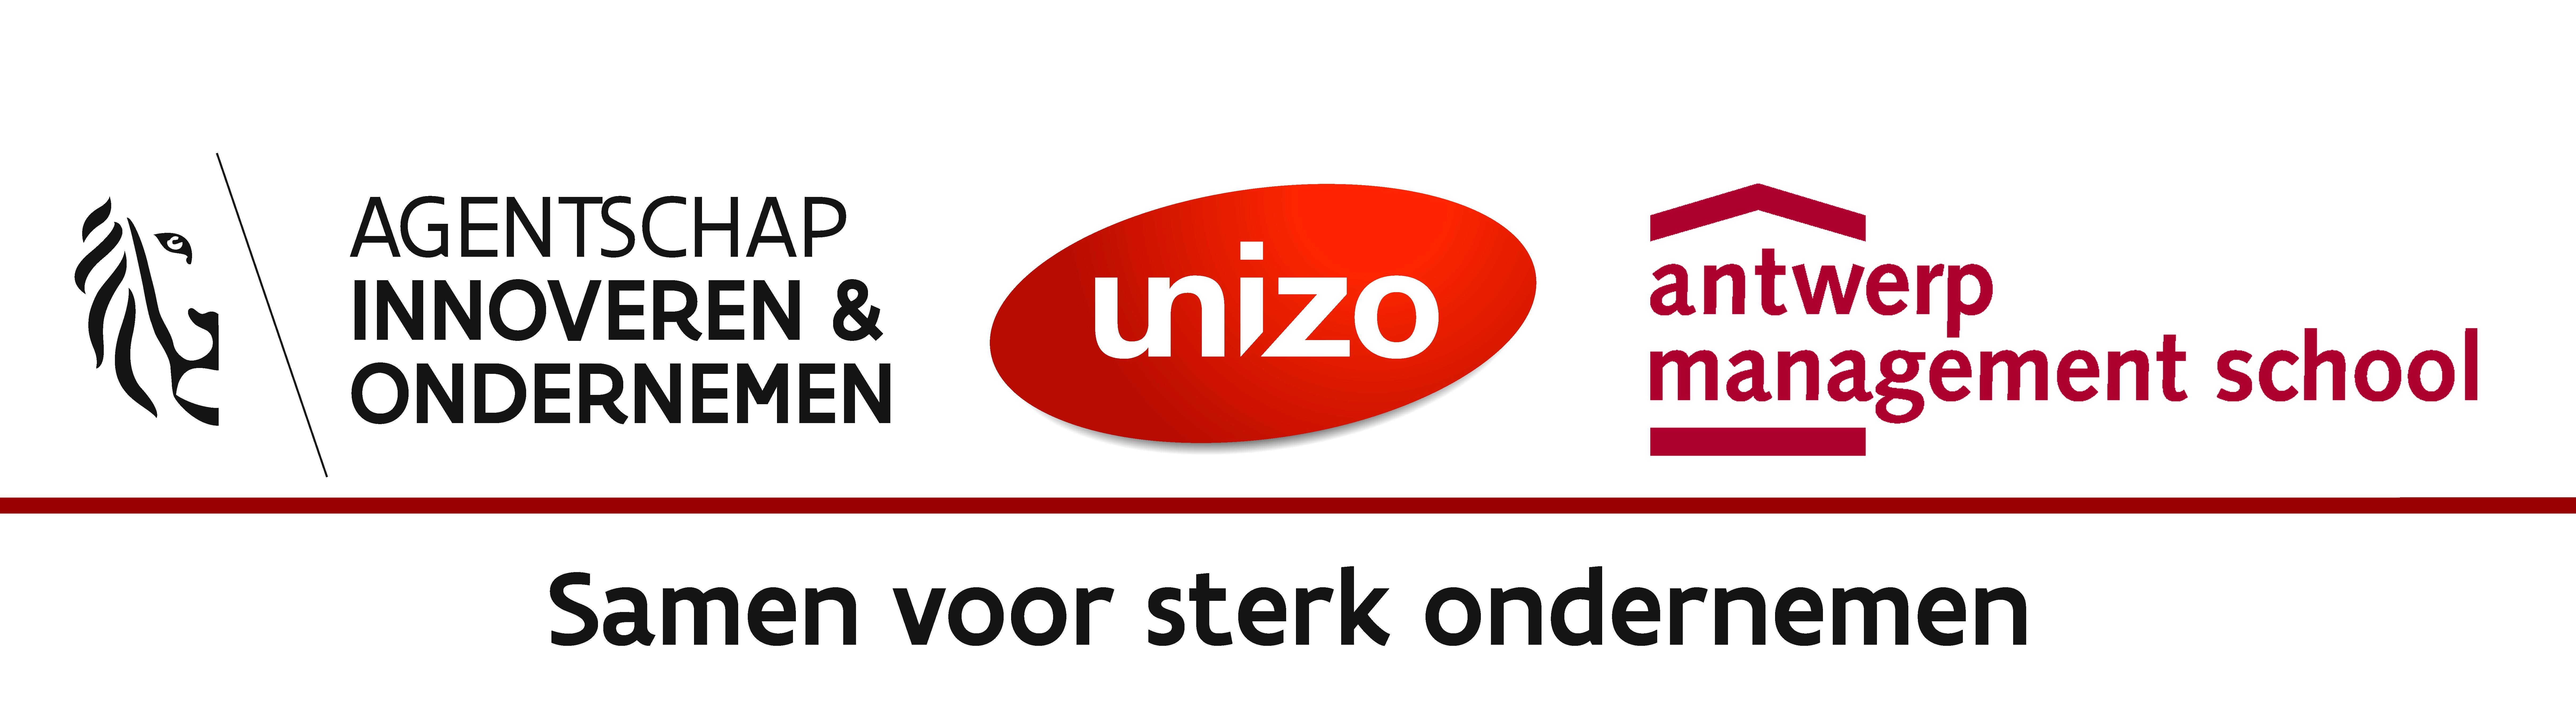 PartnerlogoVLAIO-AMS-Unizo-alternatief.jpg